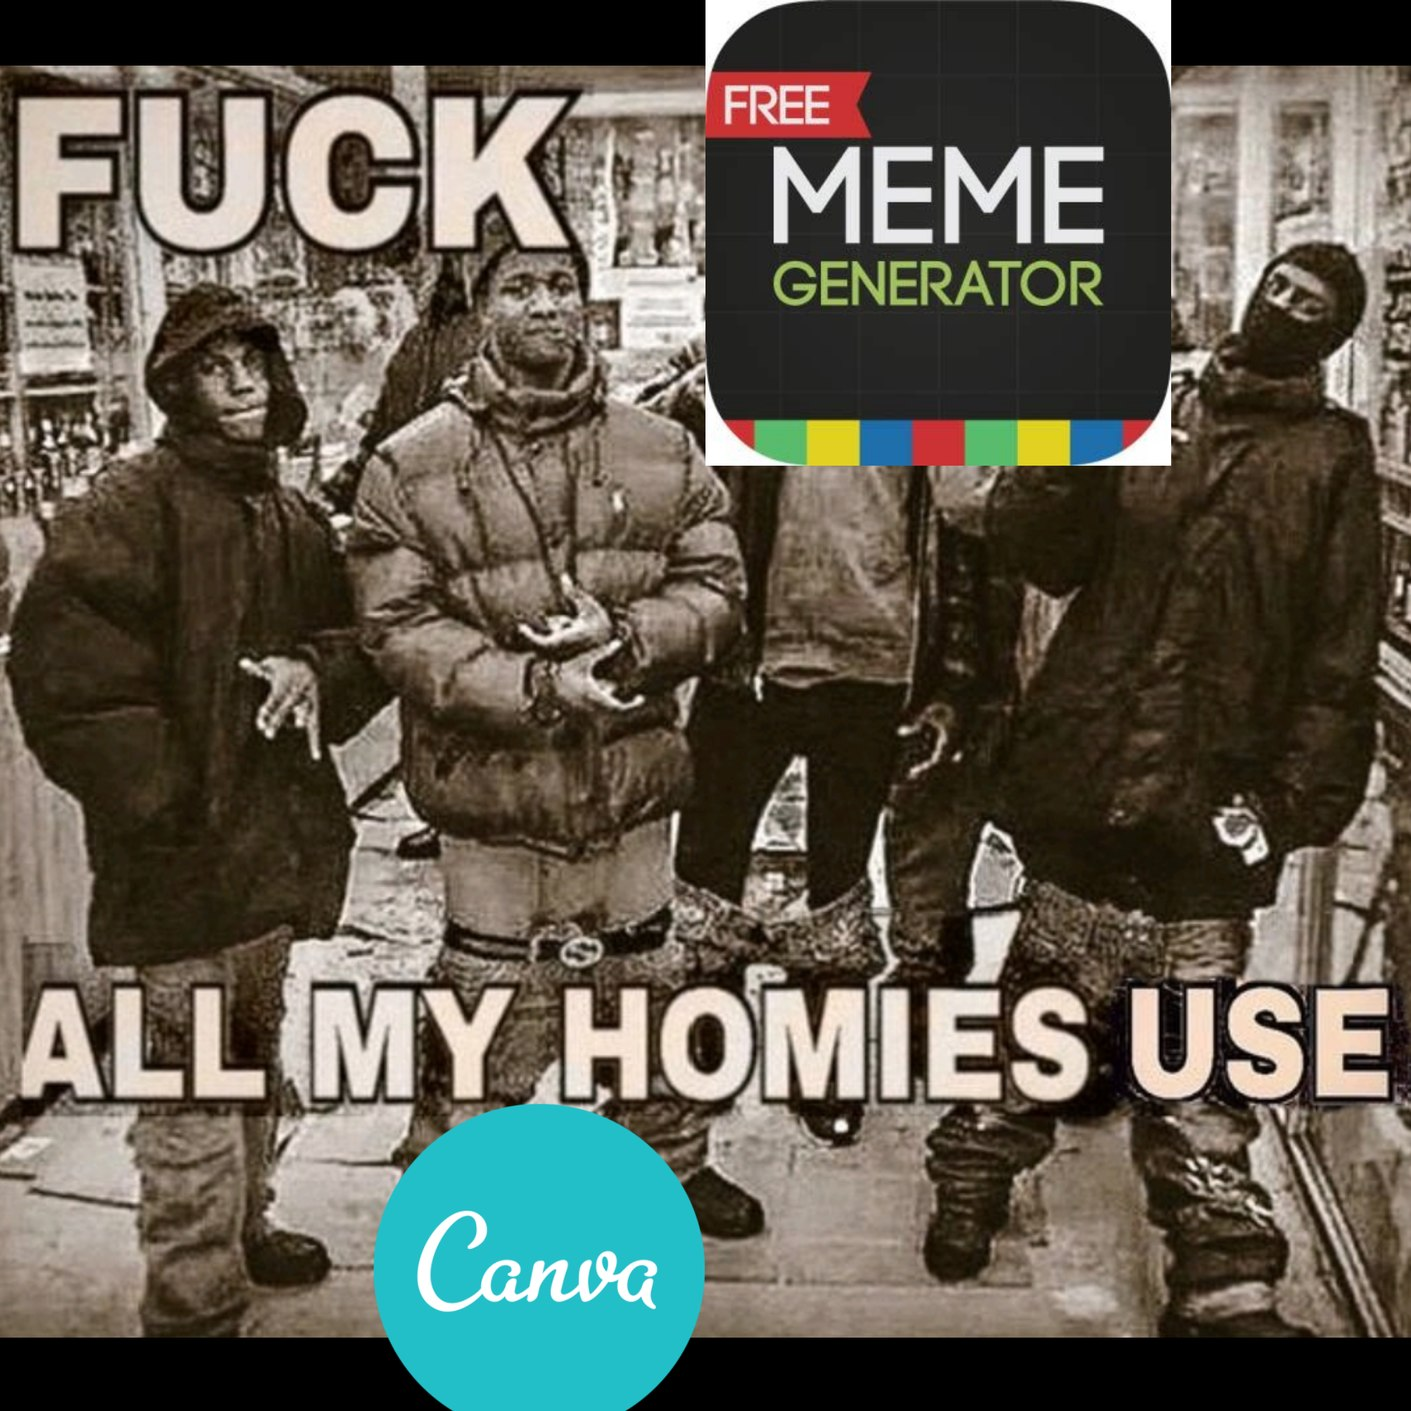 me gusta canva - meme